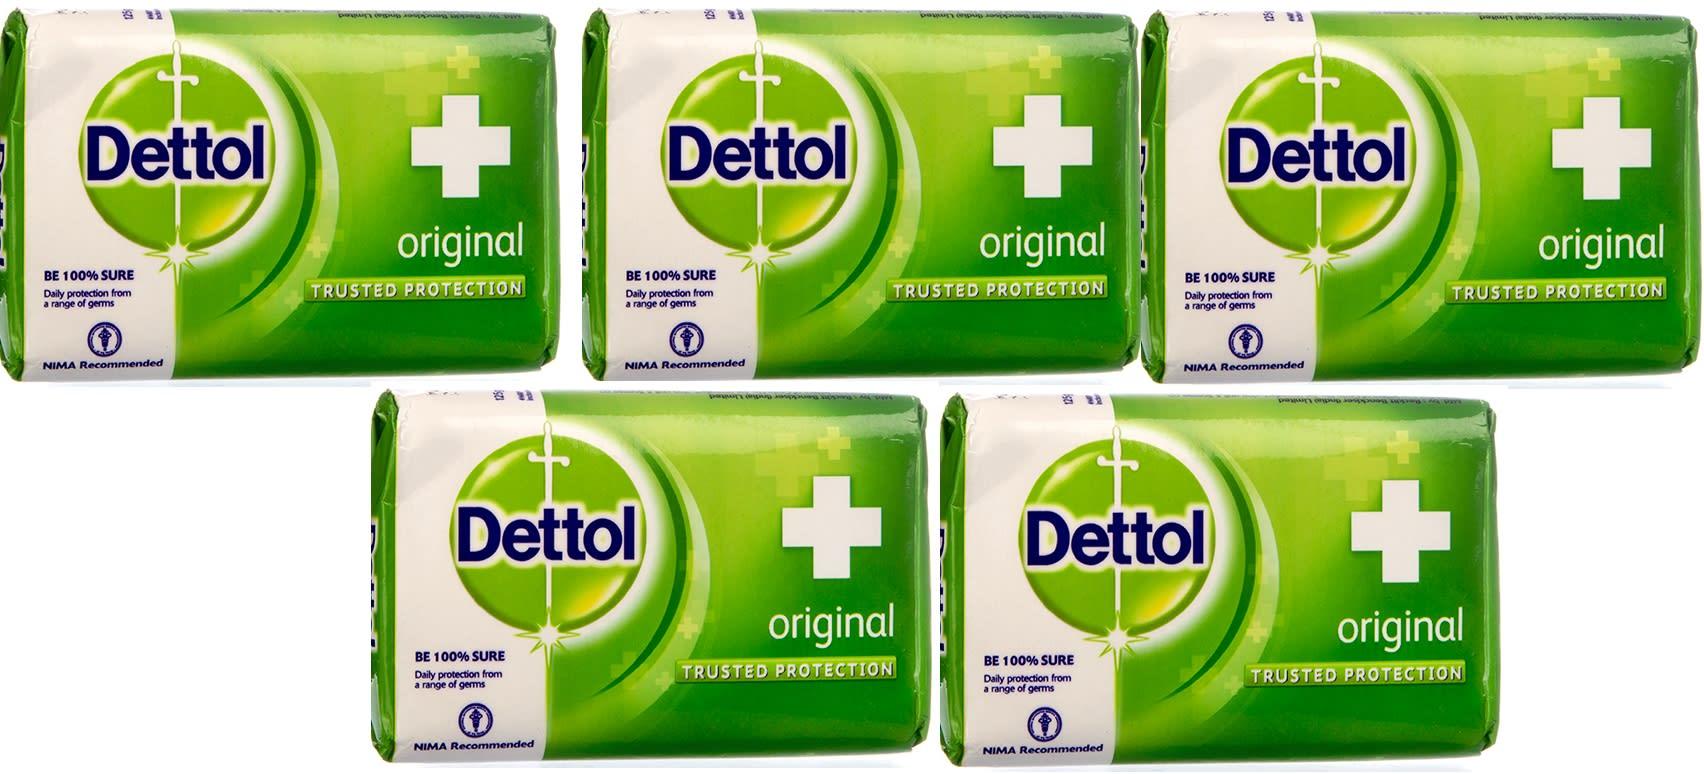 Dettol Original 75gm Soap Pack of 5